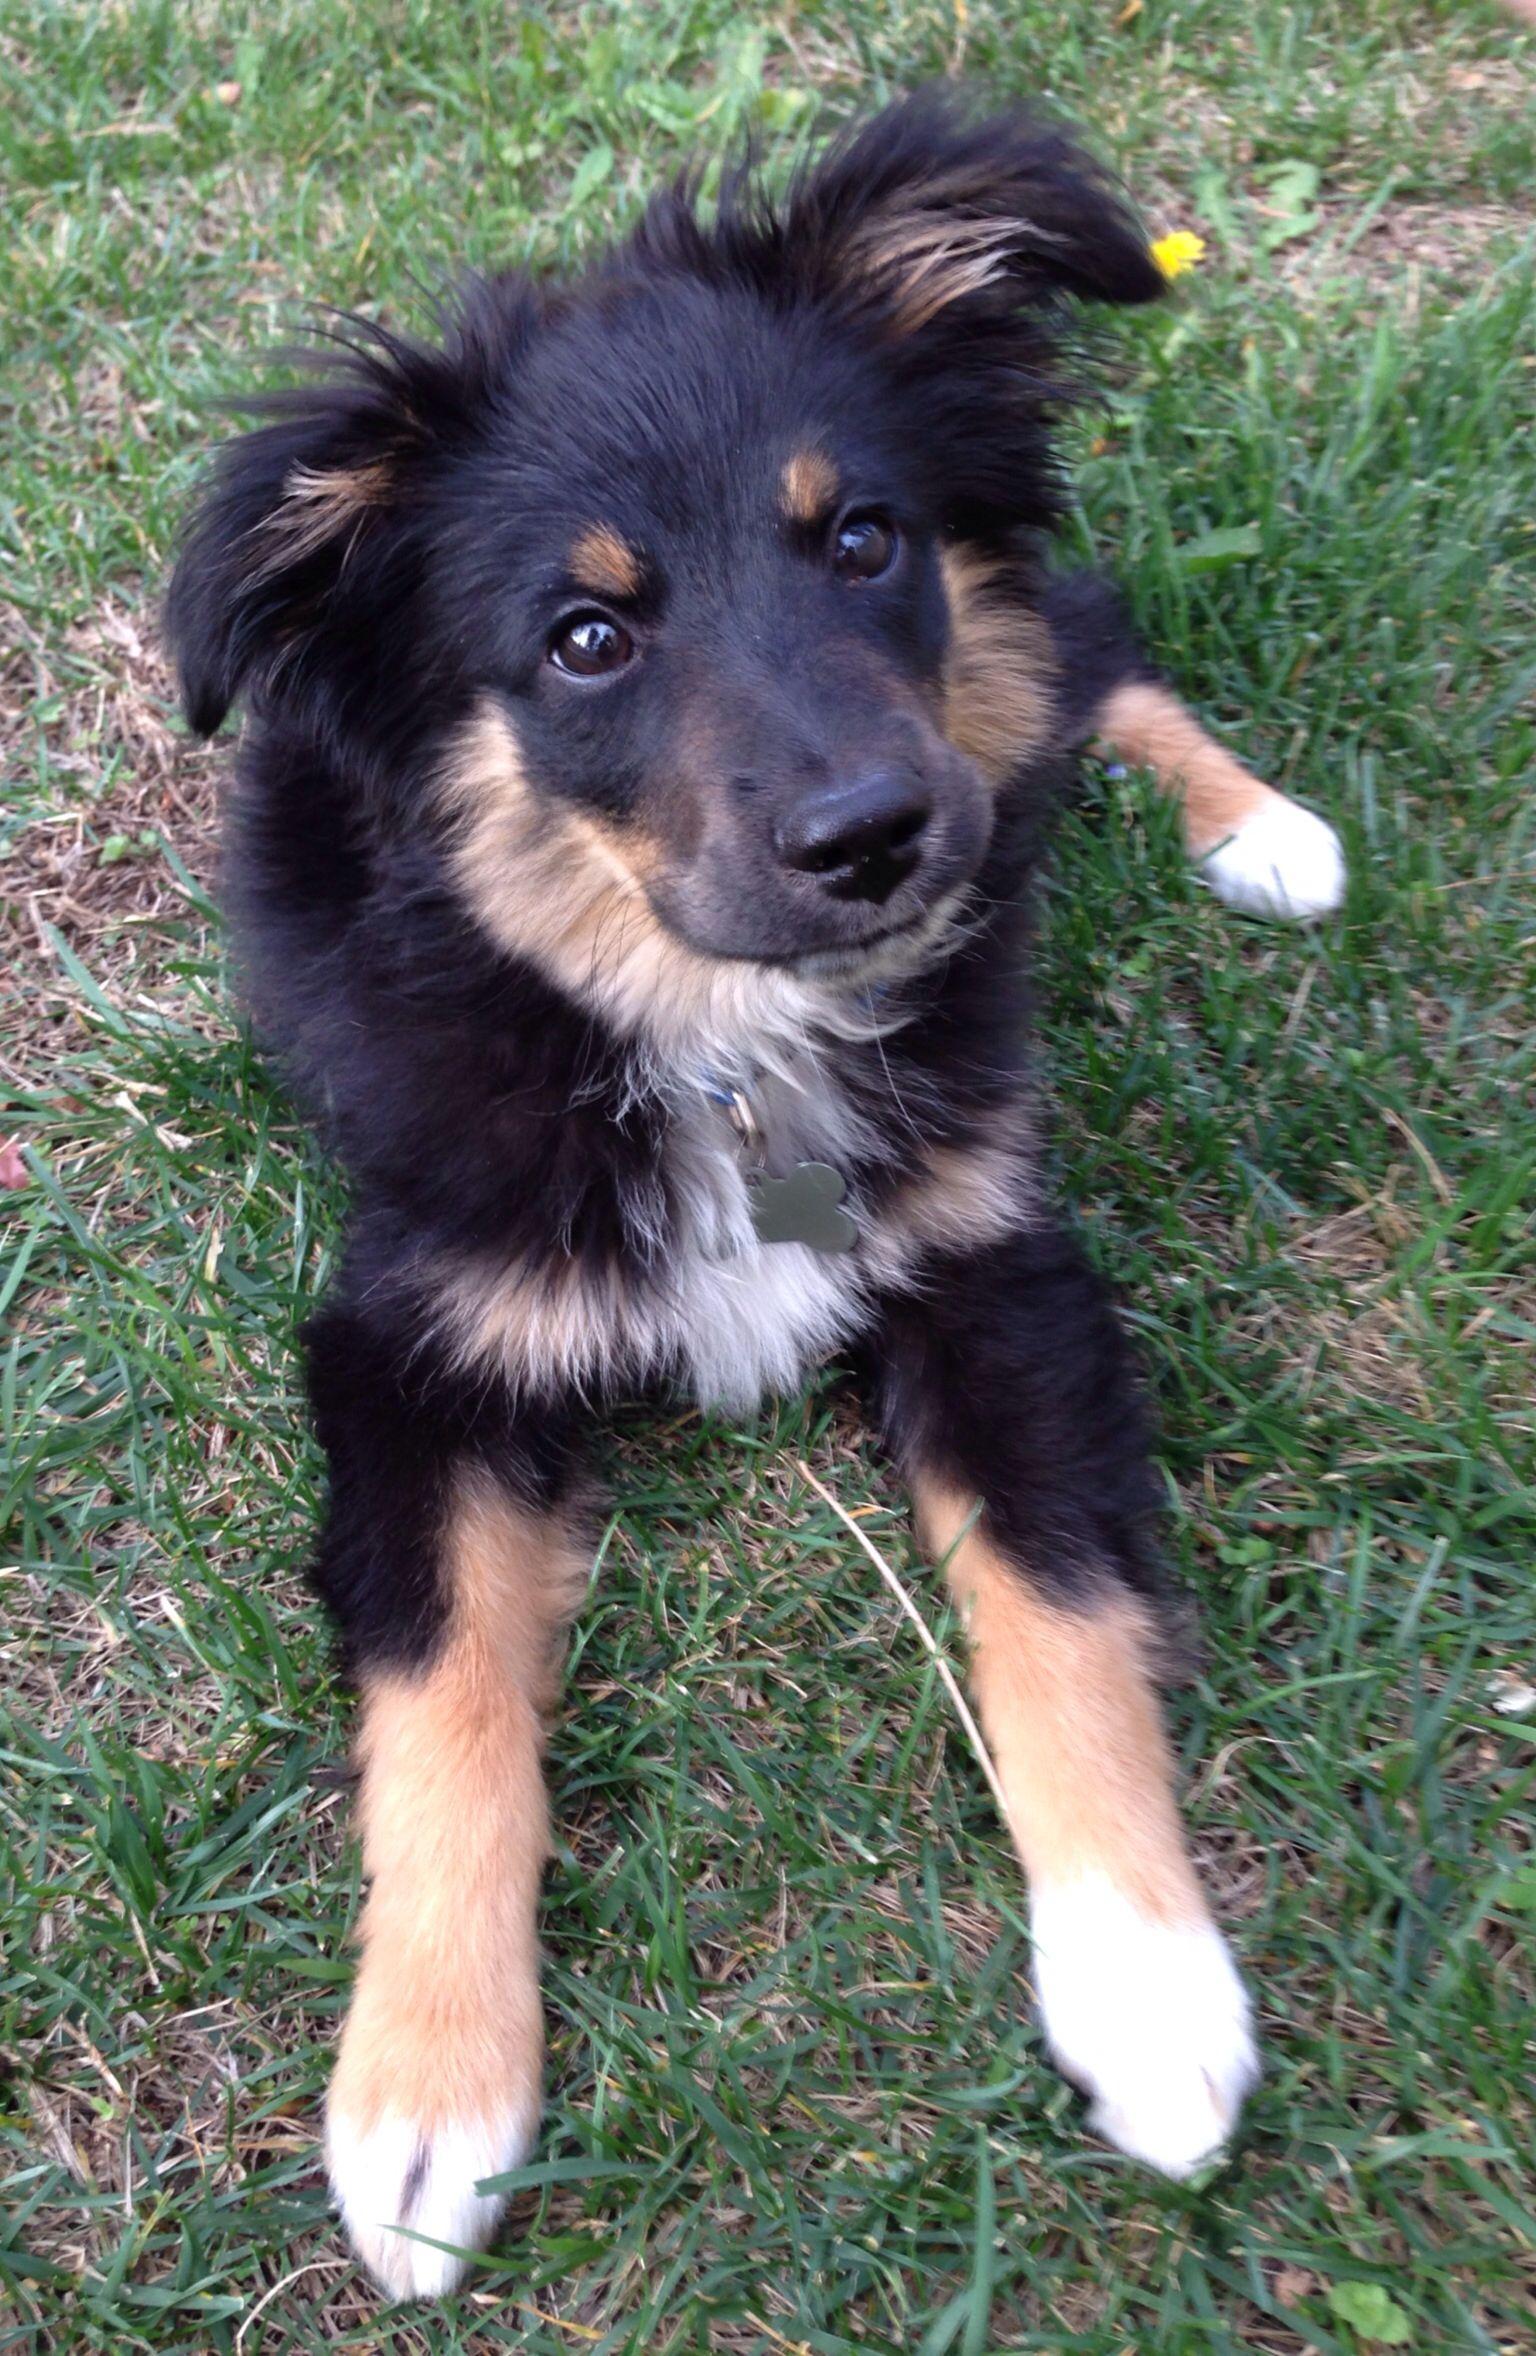 Pin By Teresa Leno Design On I Want A Puppy English Shepherd Australian Shepherd Puppy Photos